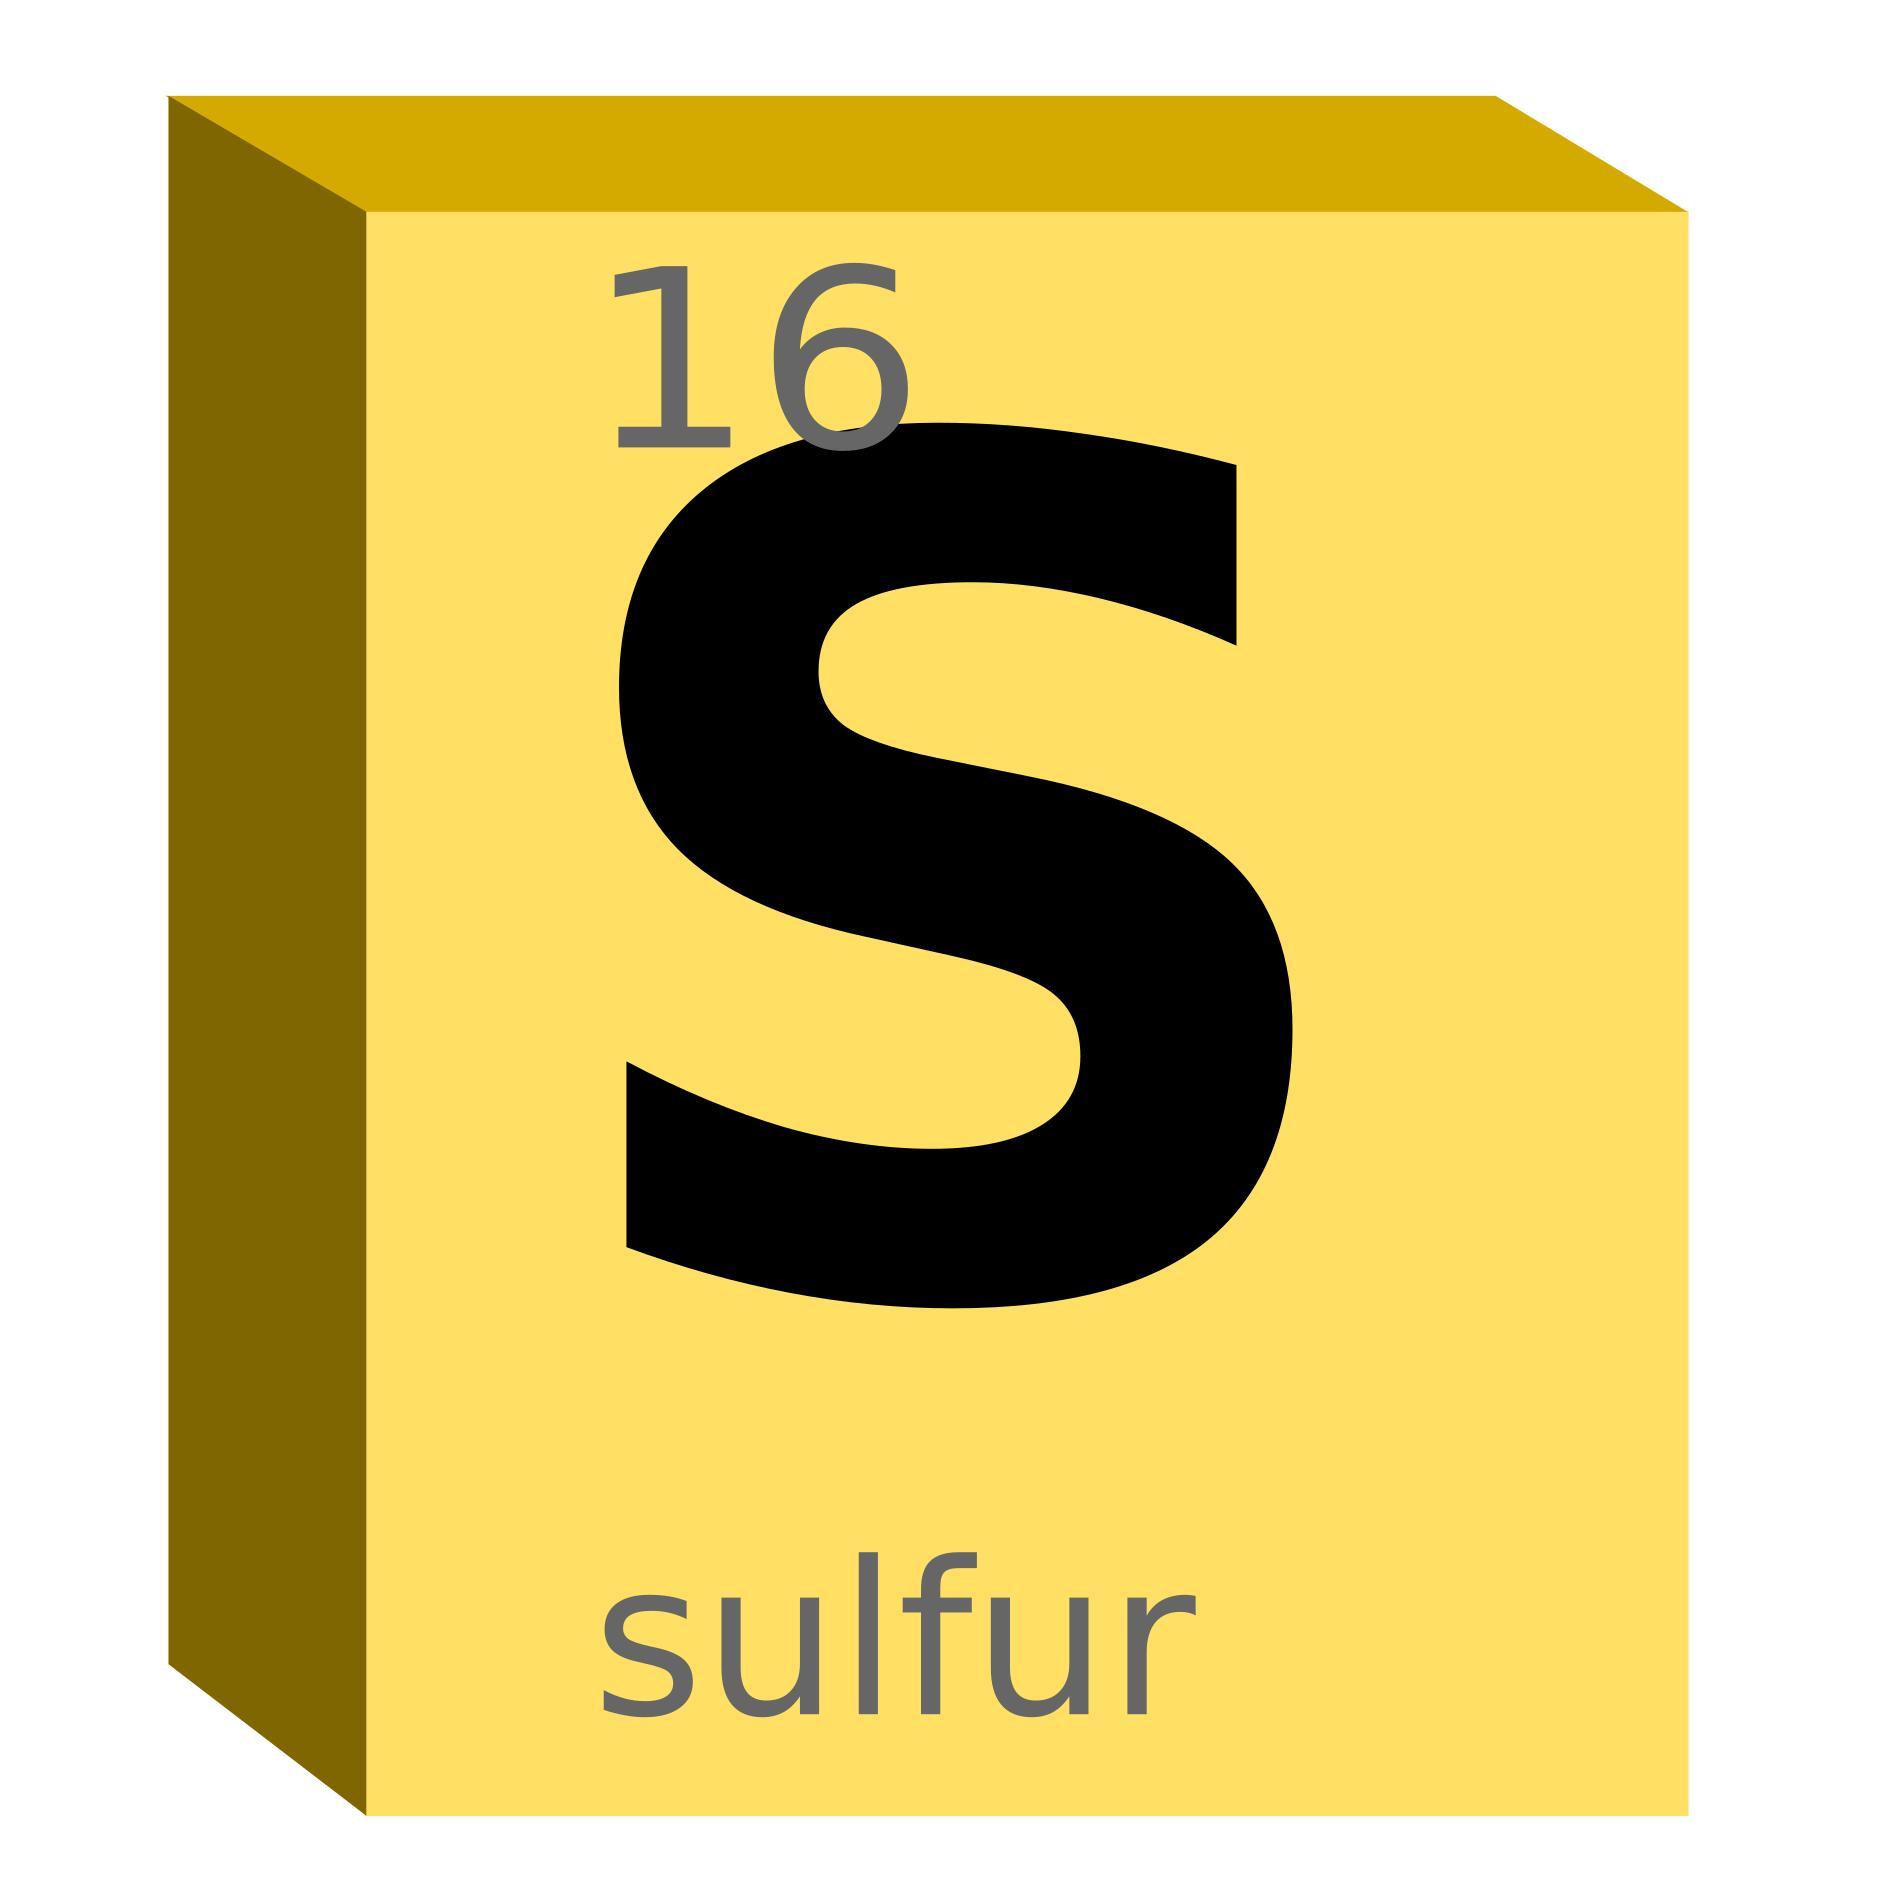 Chemistry clipart word. Sulfur s block design